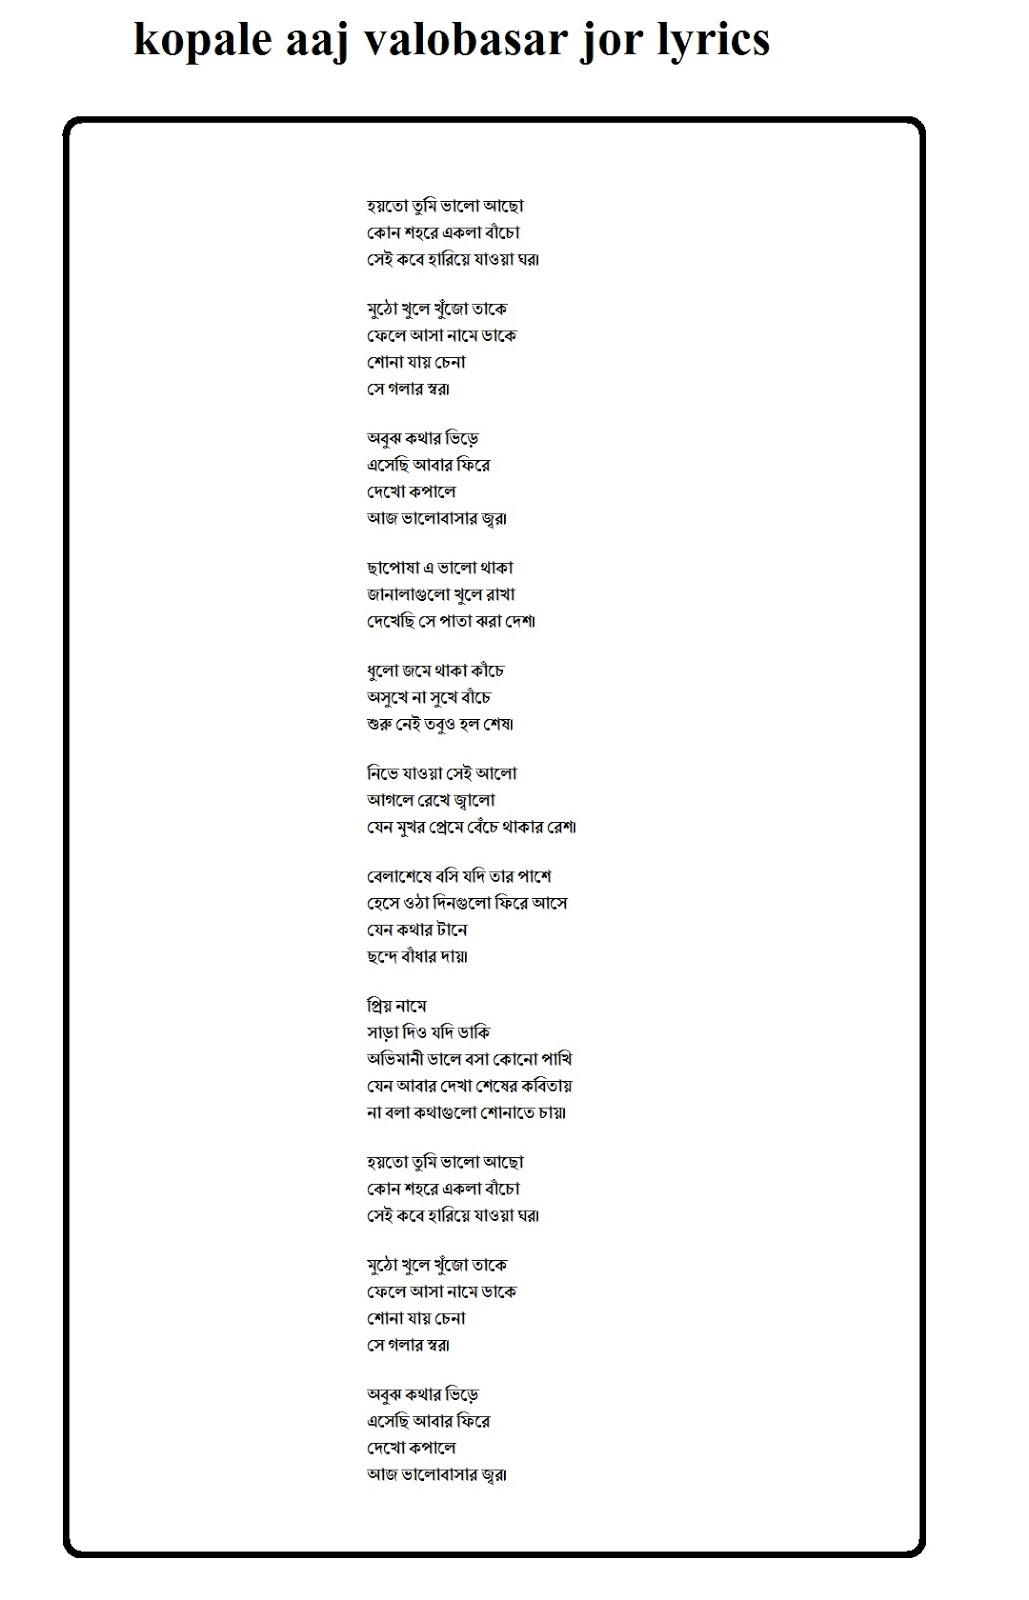 kopale aaj valobasar jor lyrics in bengali